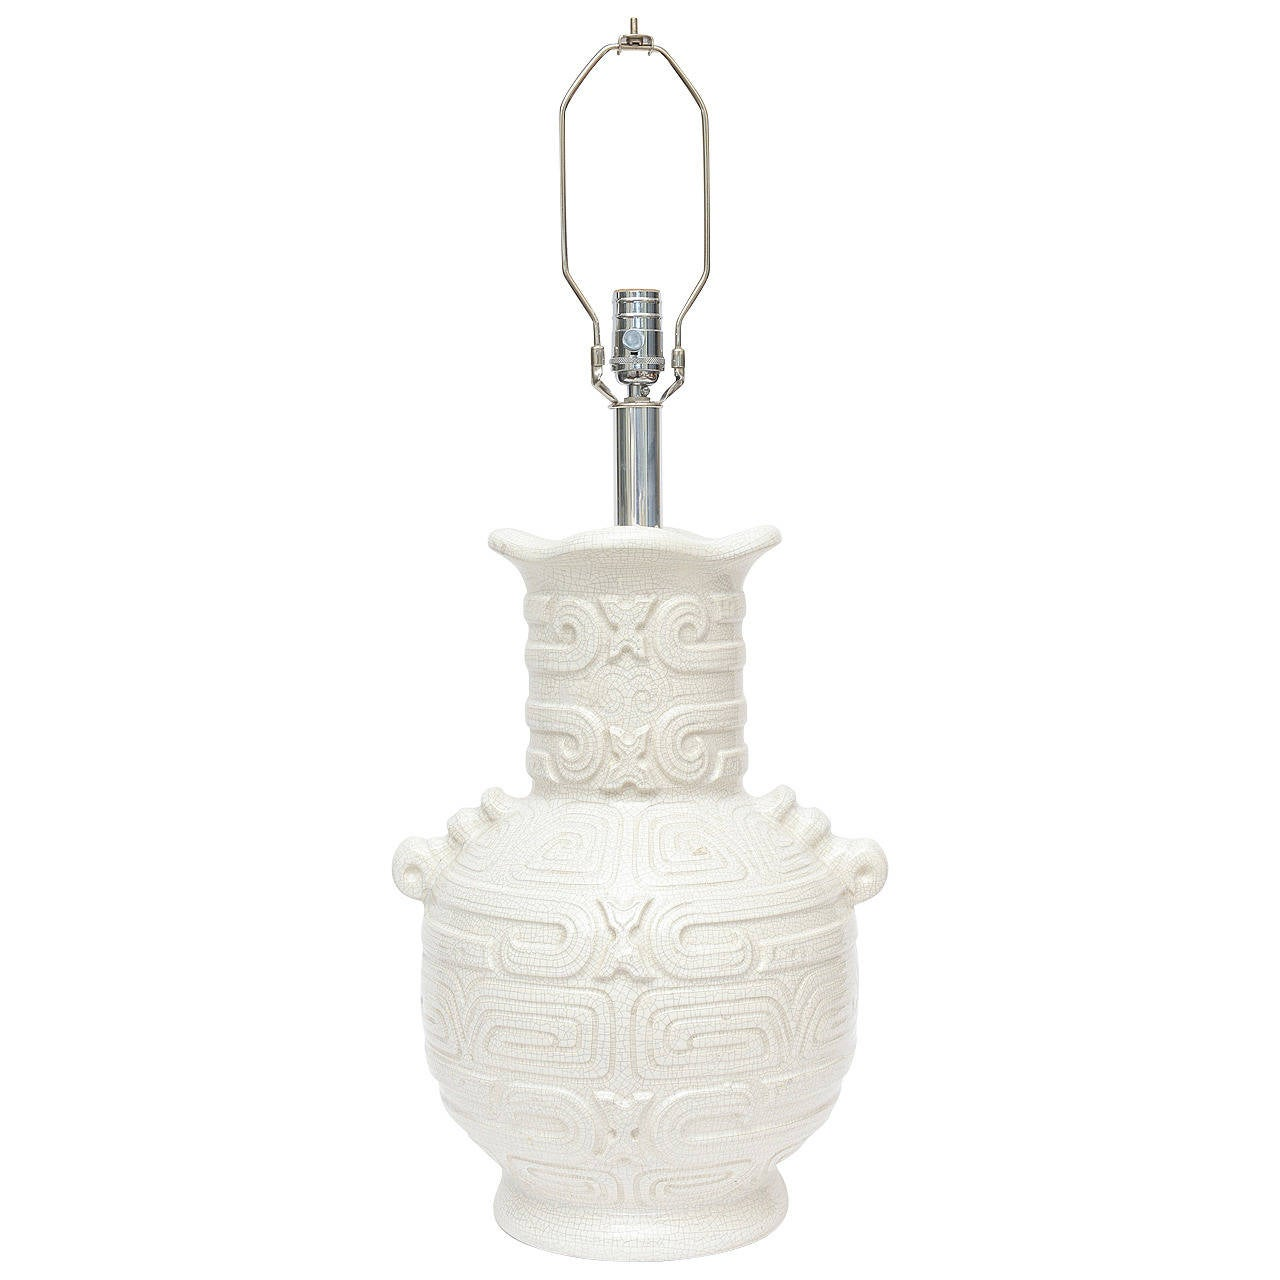 Italian Textural Aztec Inspired White Crackled Glazed Ceramic Lamp